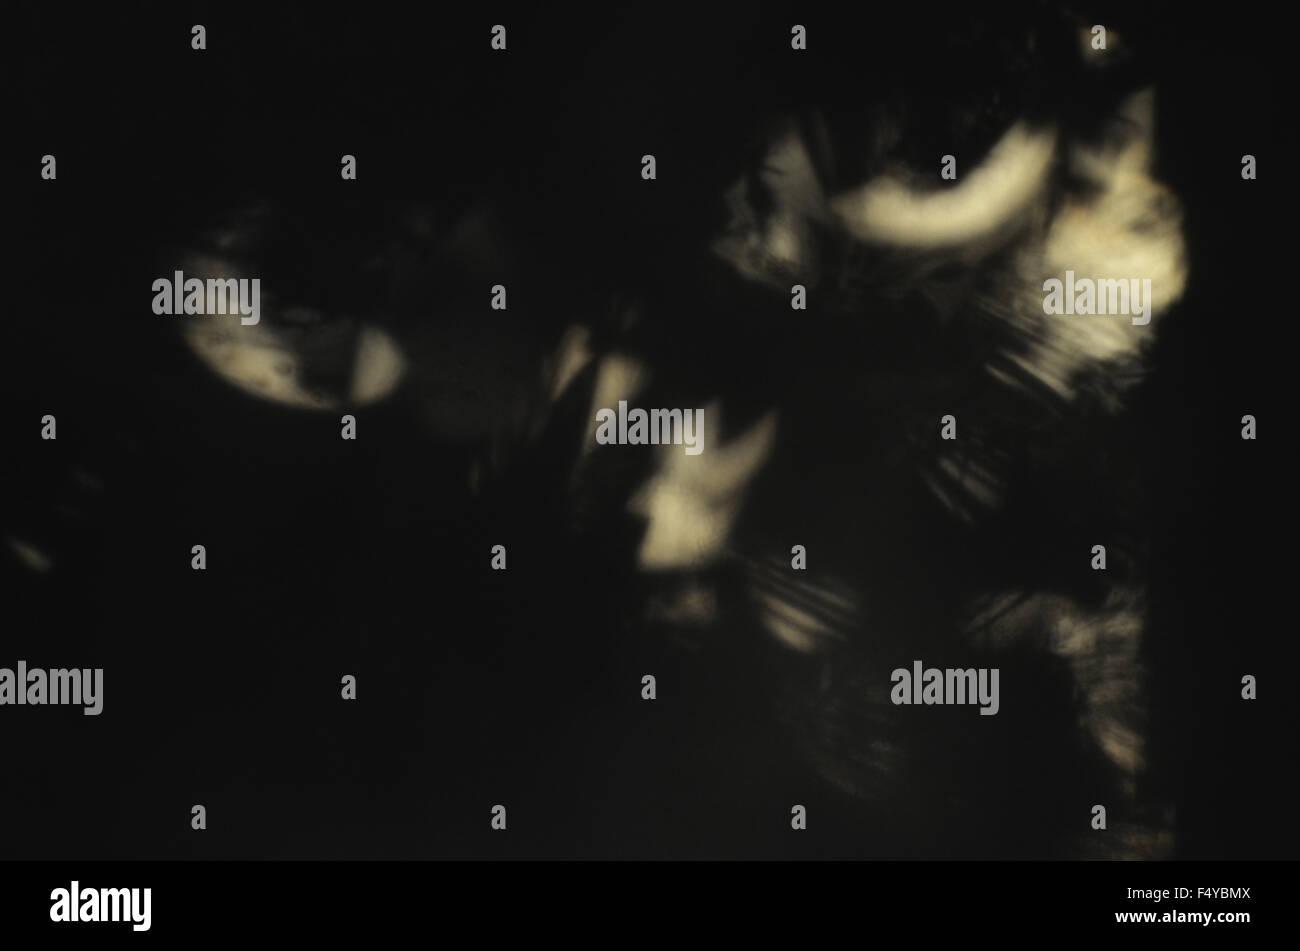 halloween shadows dark darkness scary black images depression angel spiritual bird eyes message - Stock Image